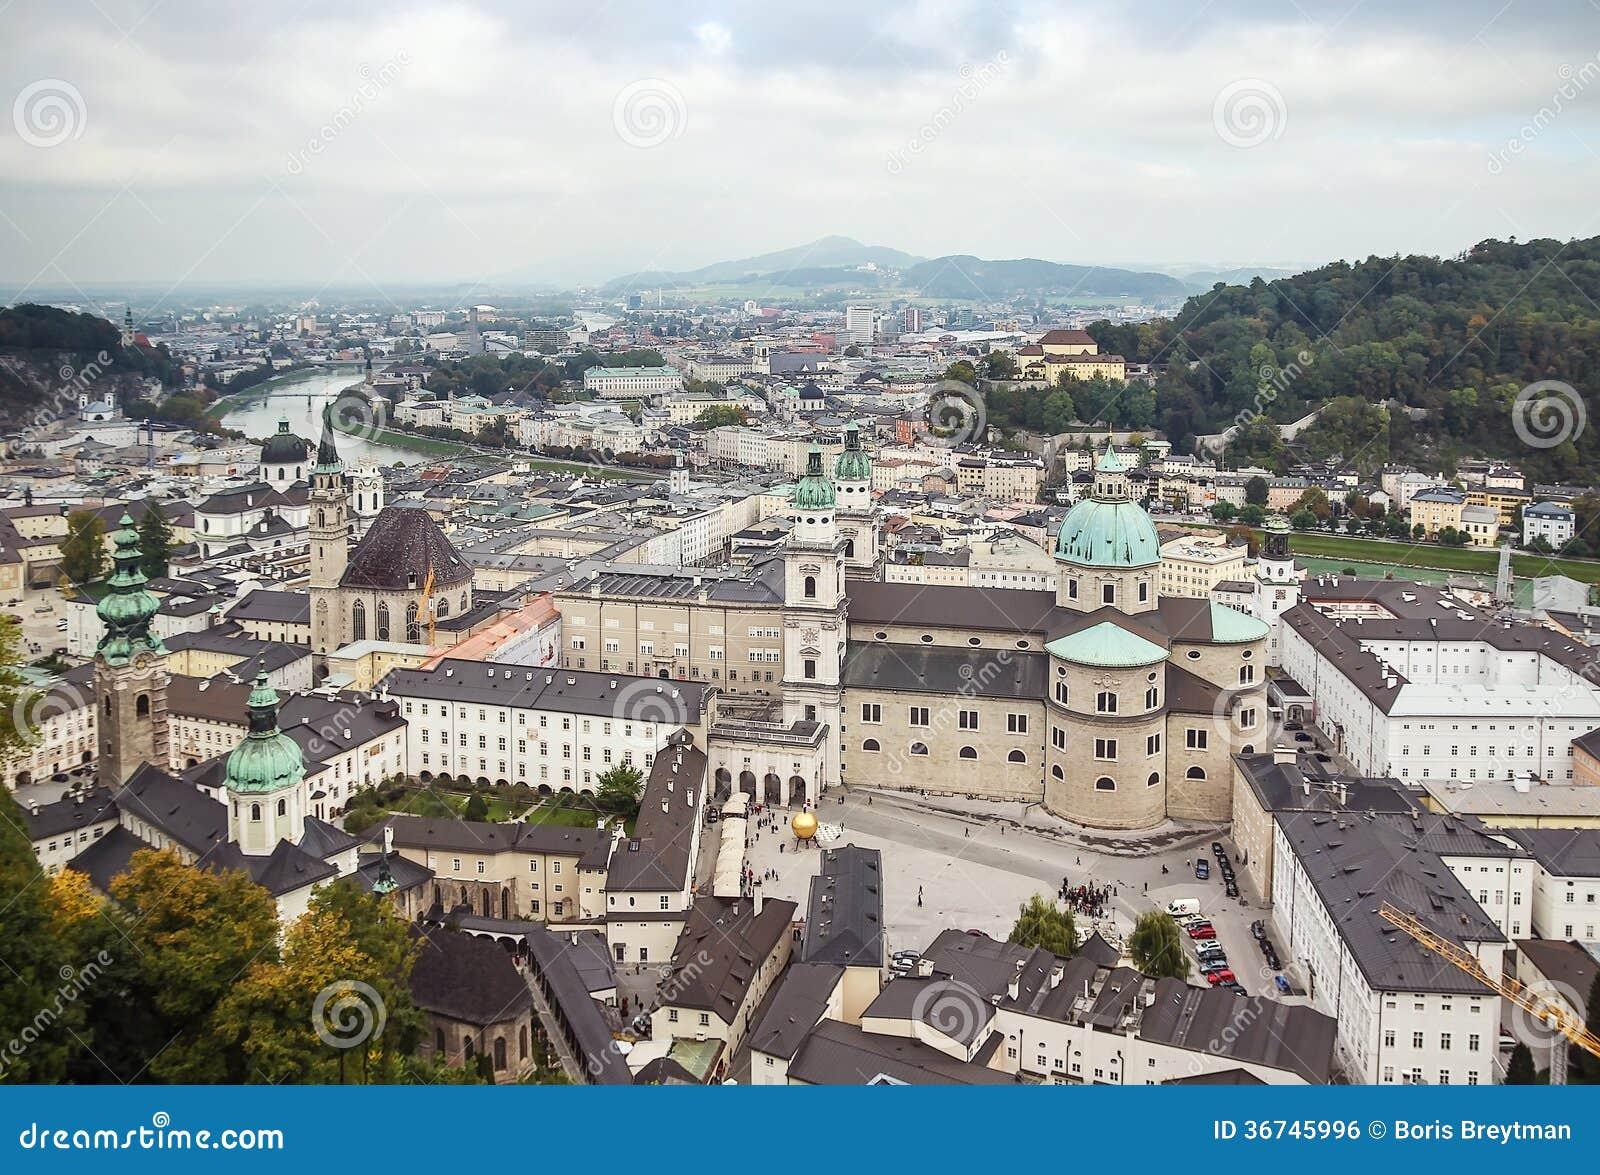 The Historic Center Of Salzburg Austria Stock Photo